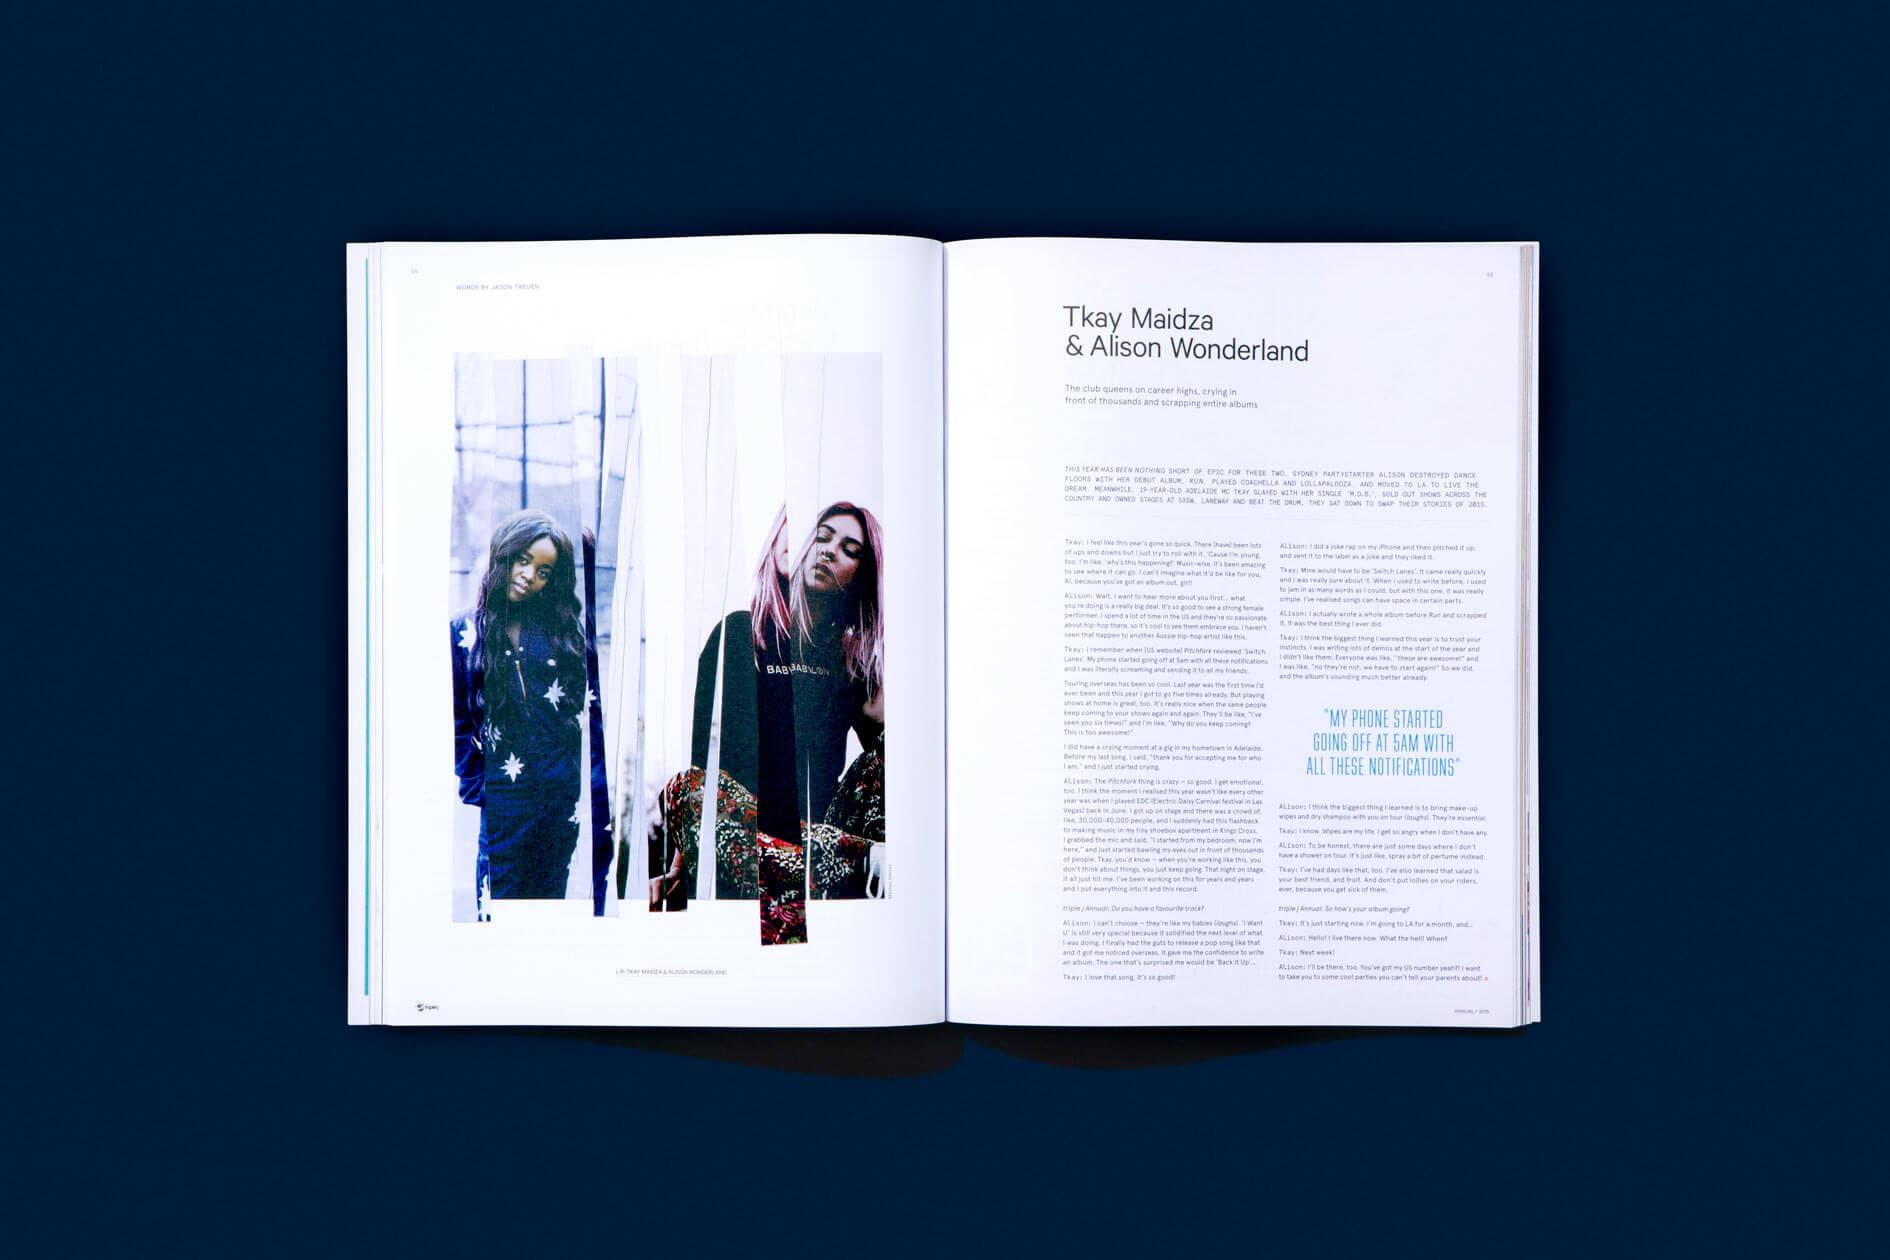 NatCarroll_triplej_Annual_2015_Magazine_TkayMaidza_AlisonWonderland_Spread_10col